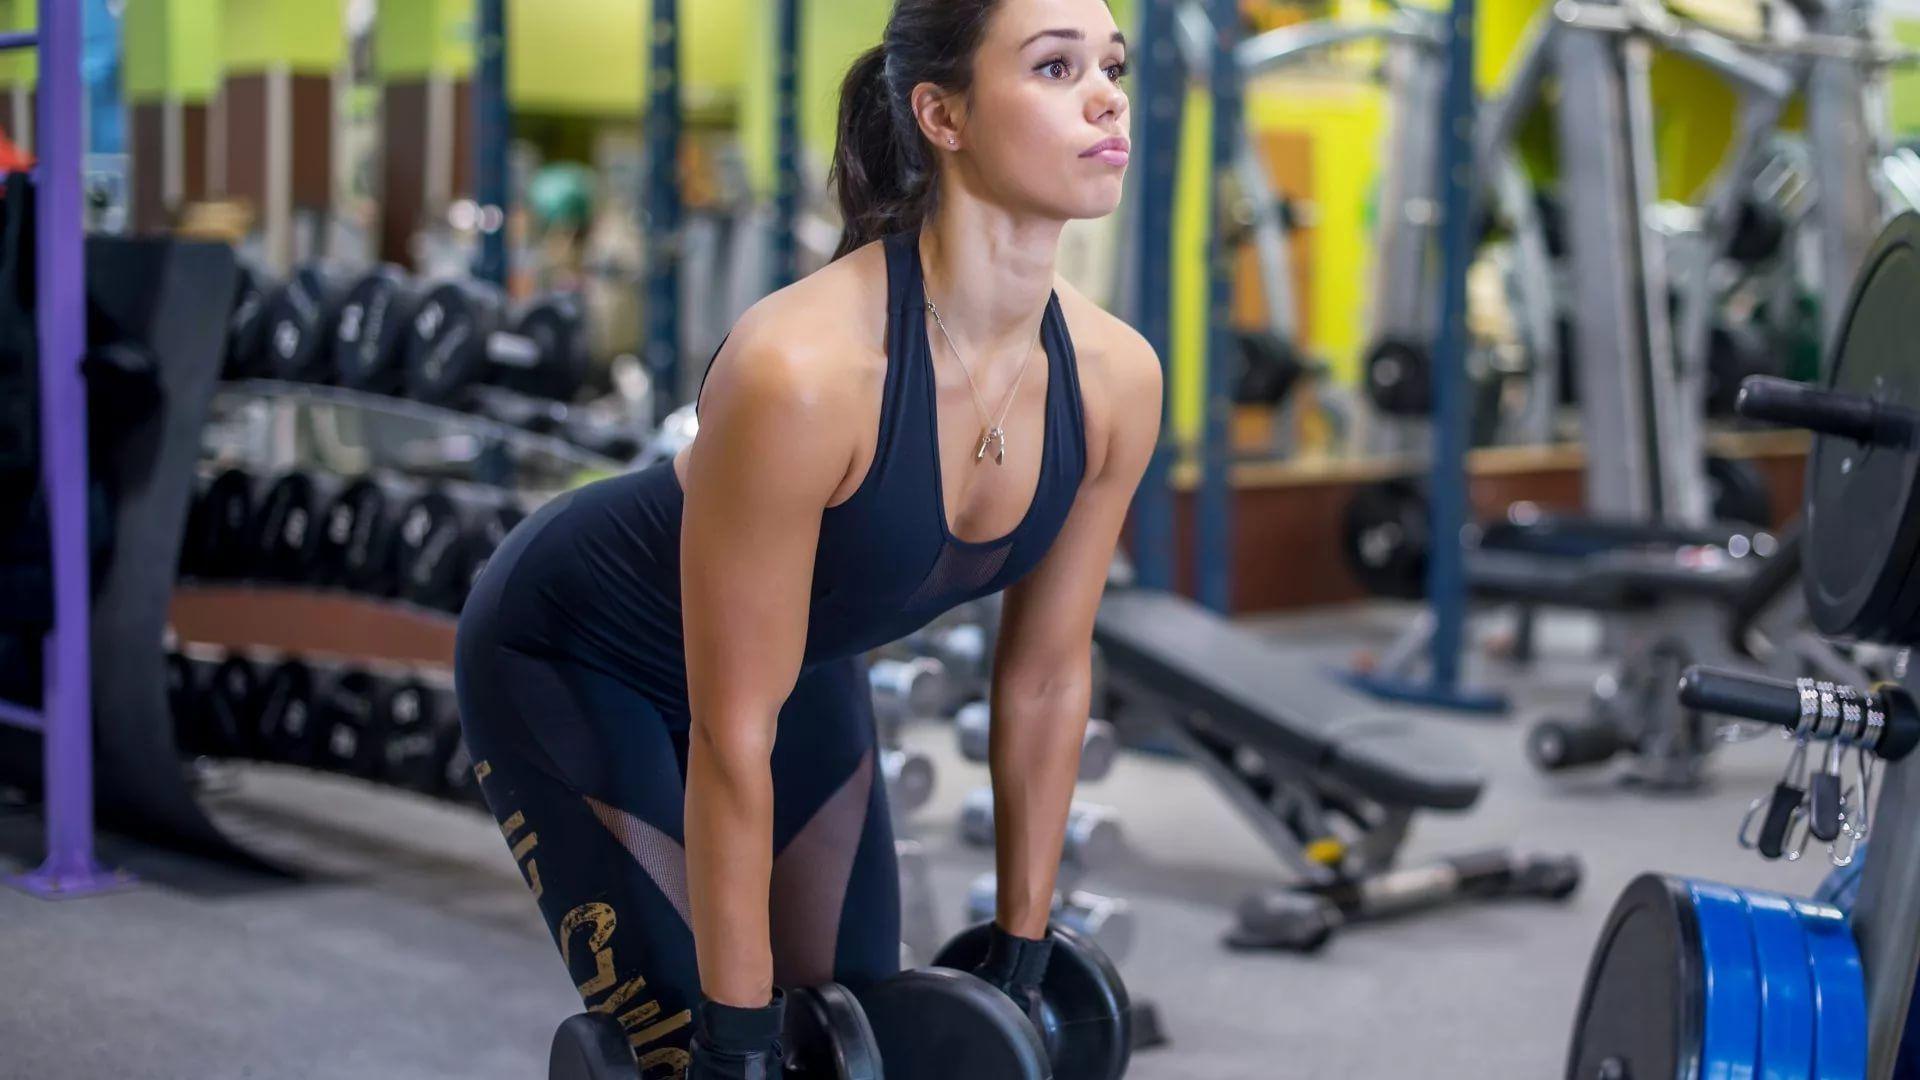 Workout Background Wallpaper HD